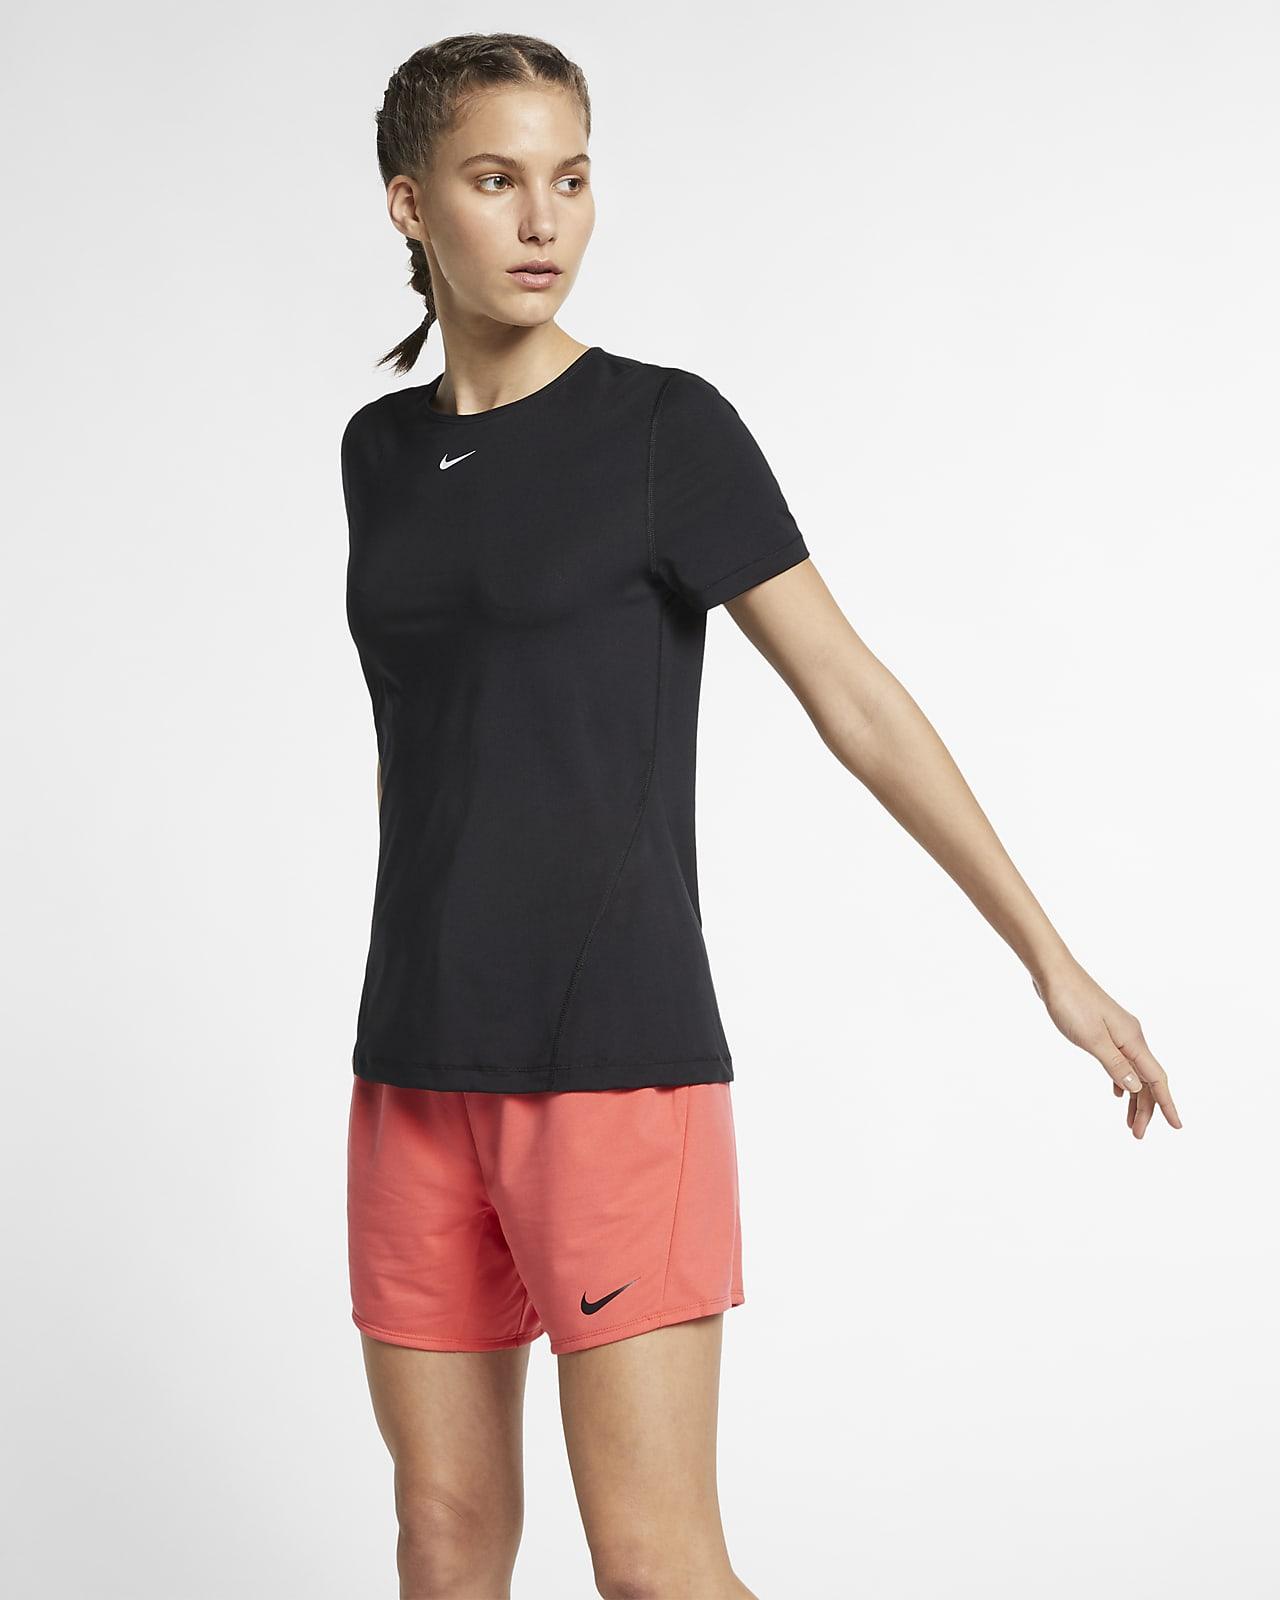 Nike Pro Kurzarm-Trainingsoberteil für Damen